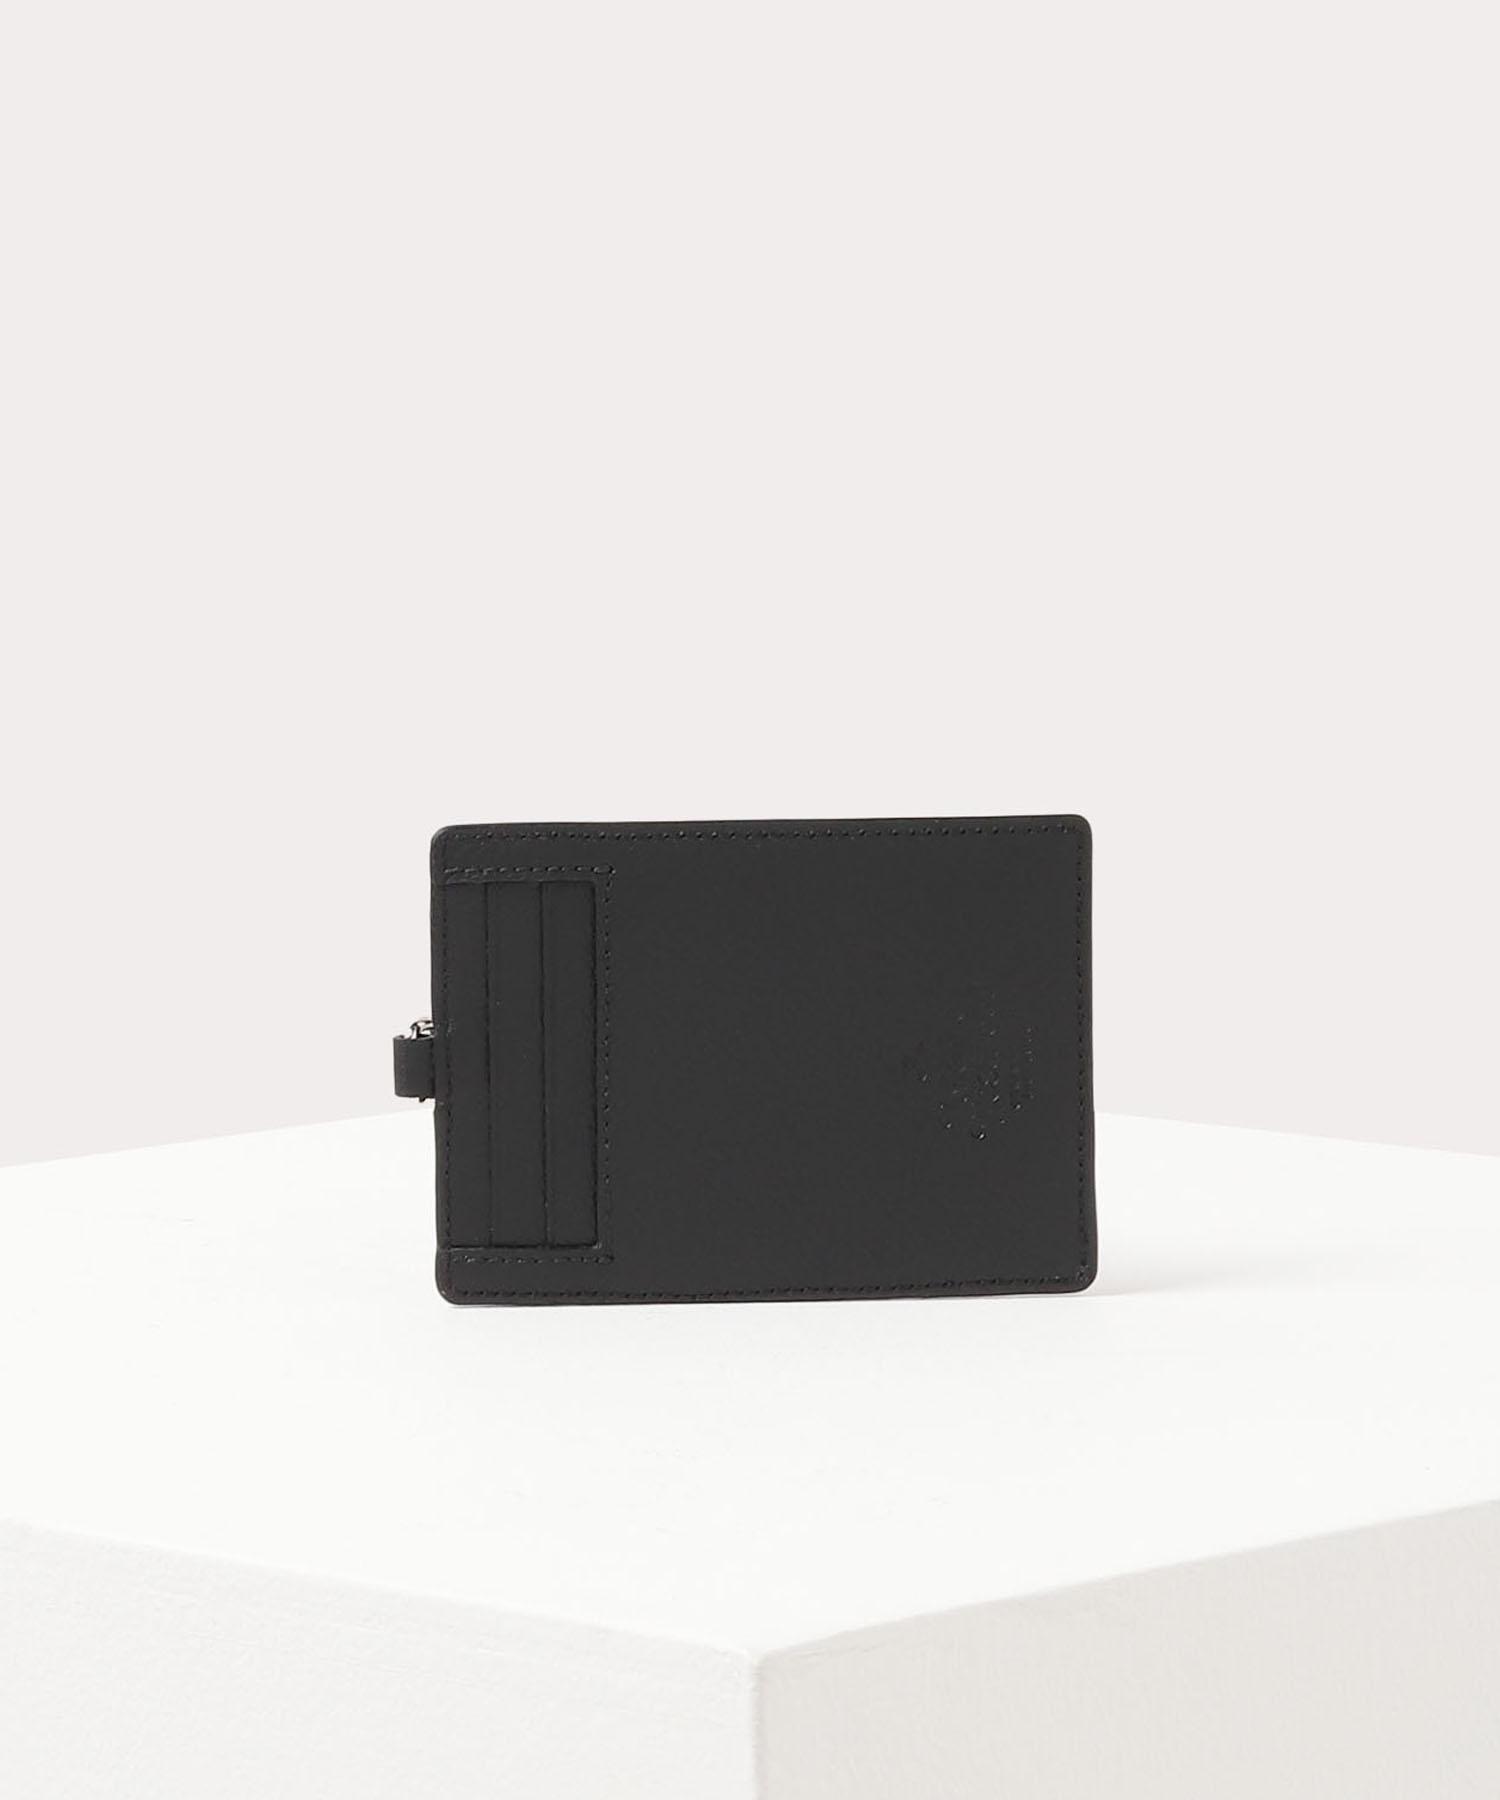 CHELSEA ストラップ付カードケース